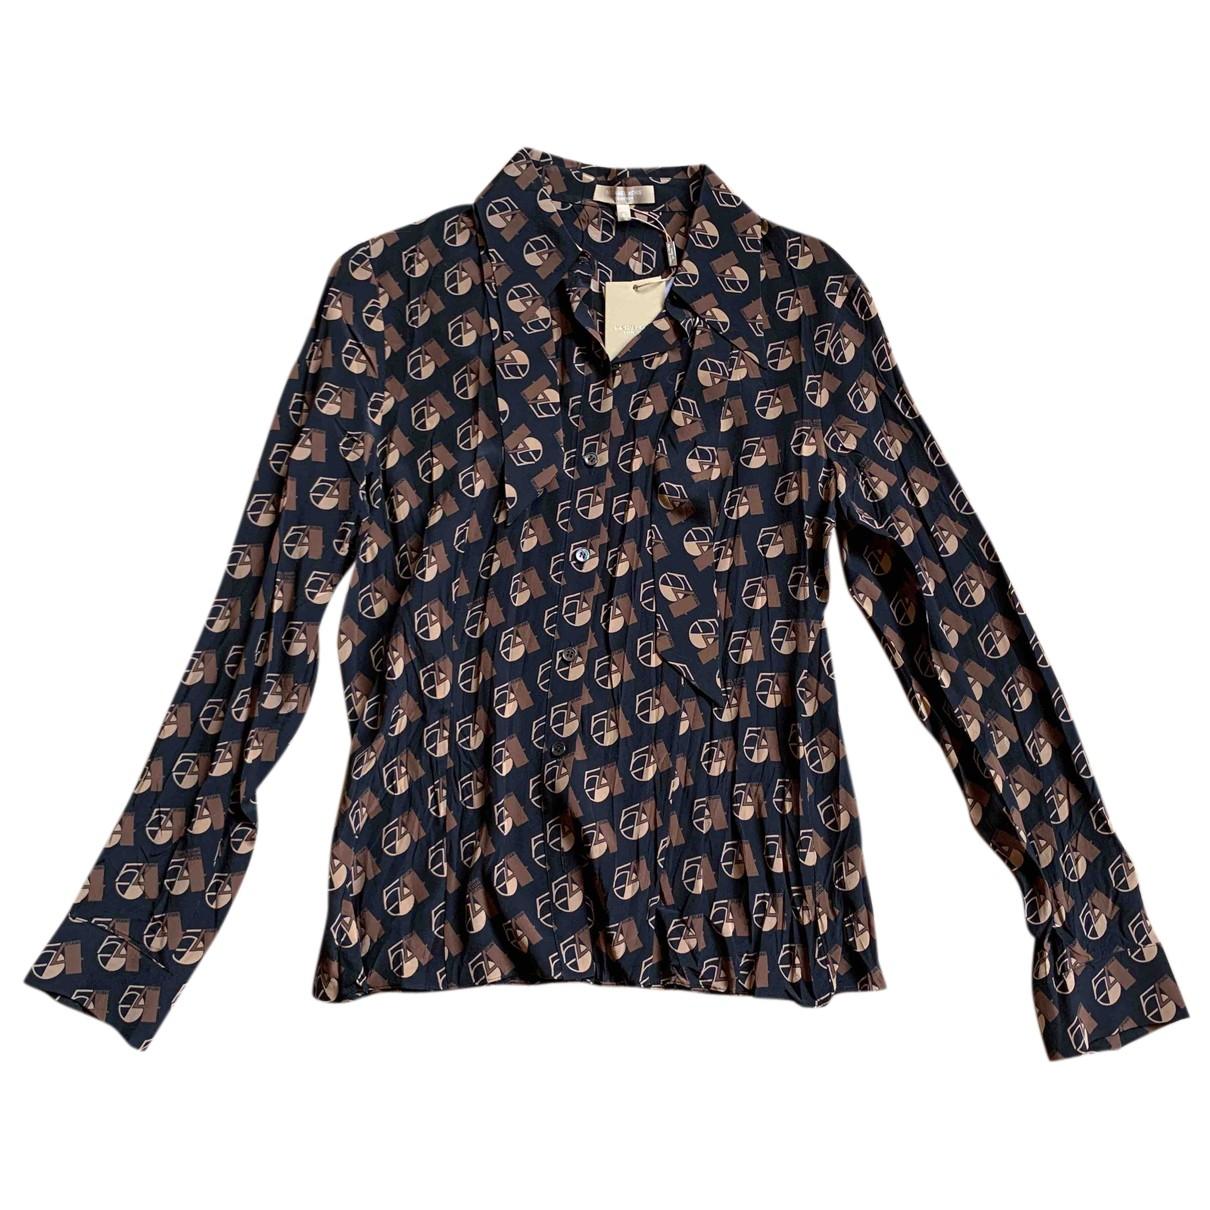 Michael Kors N Black Silk  top for Women 6 US